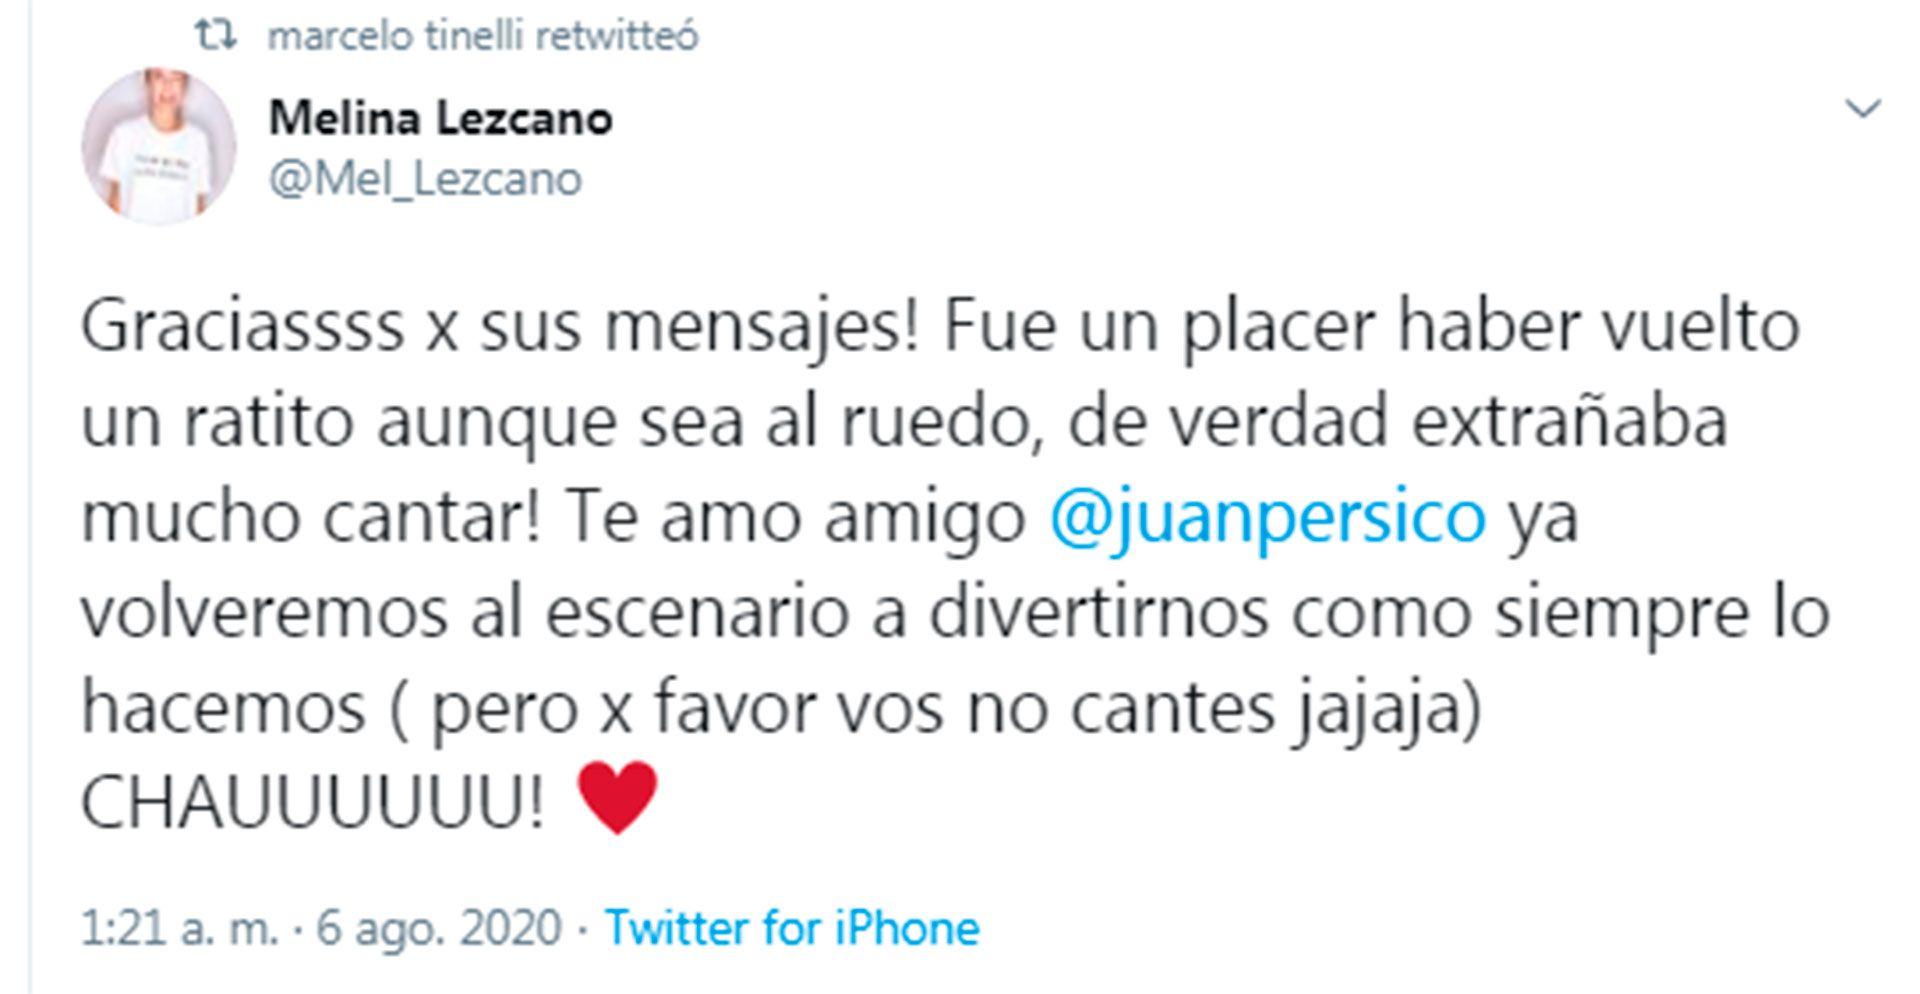 Mensaje de Melina Lescano